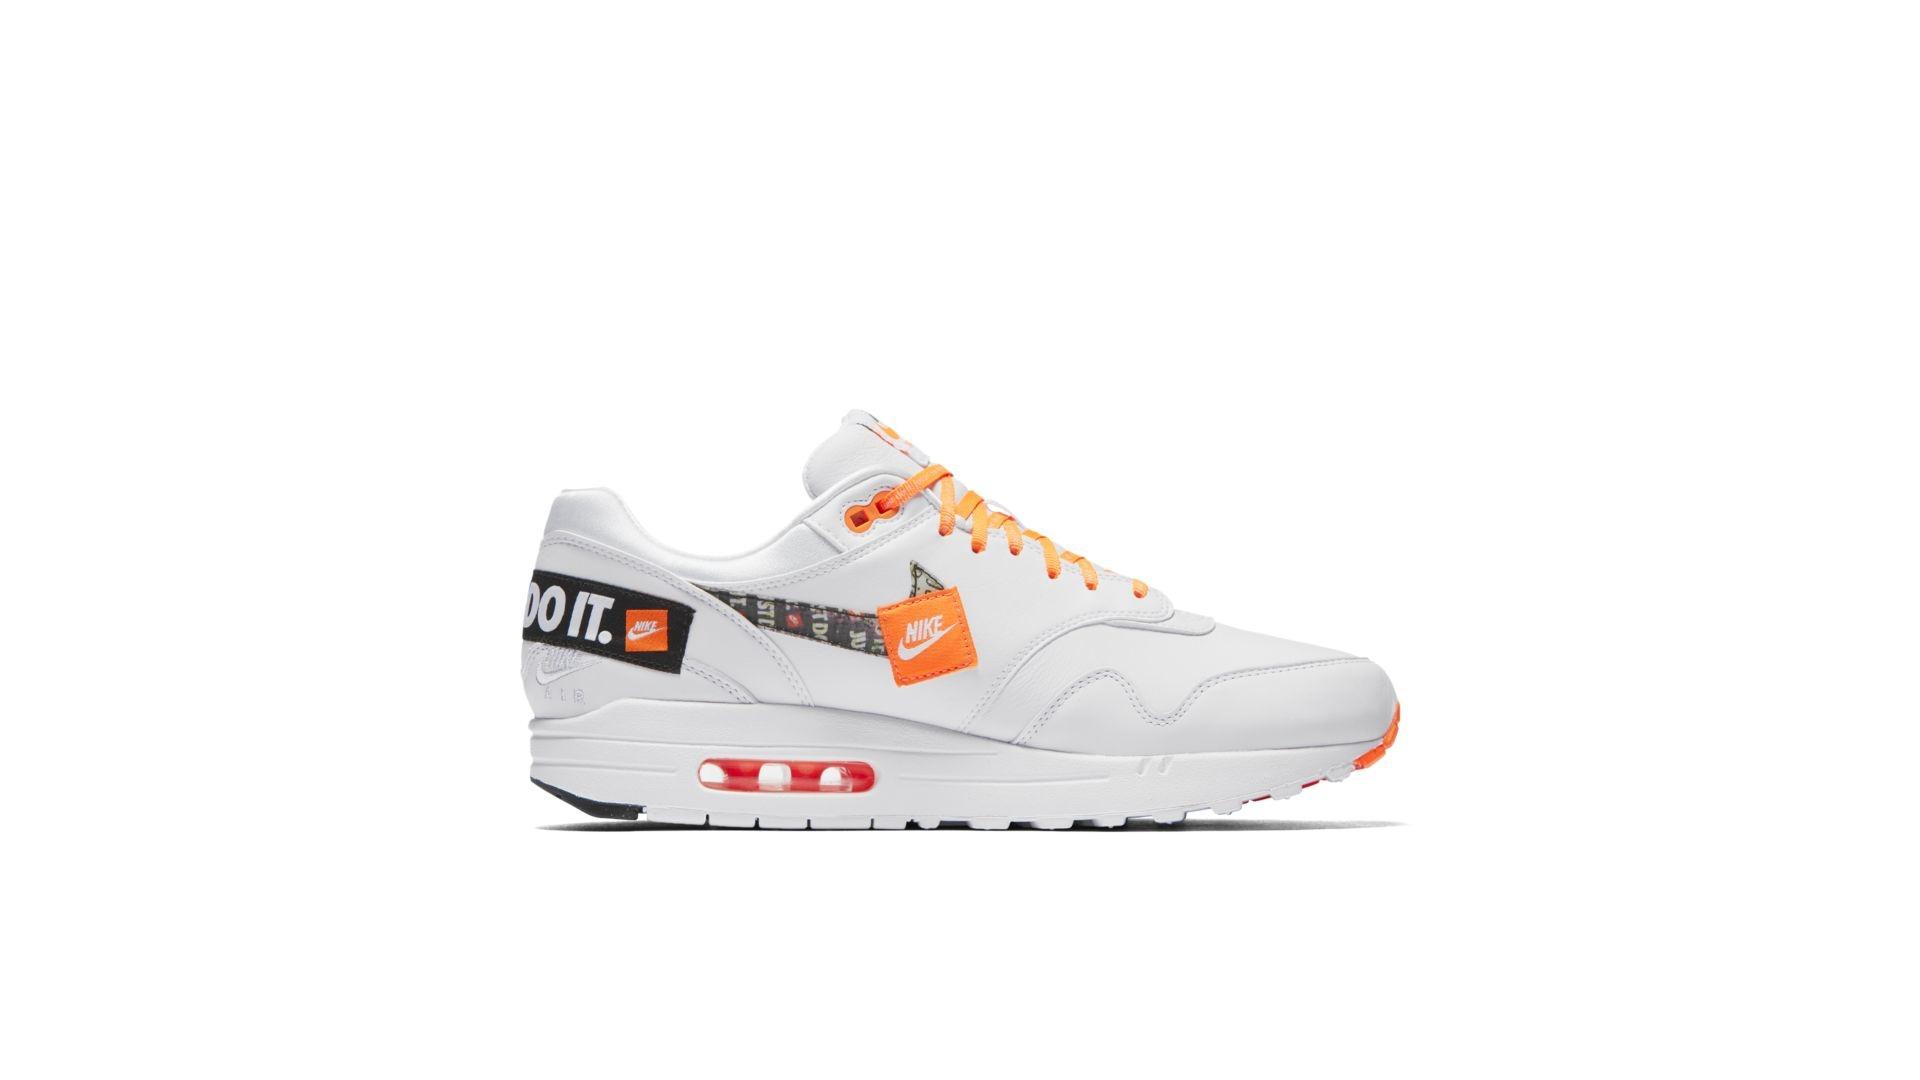 Nike Air Max 1 'Just Do It White' - Sneakin